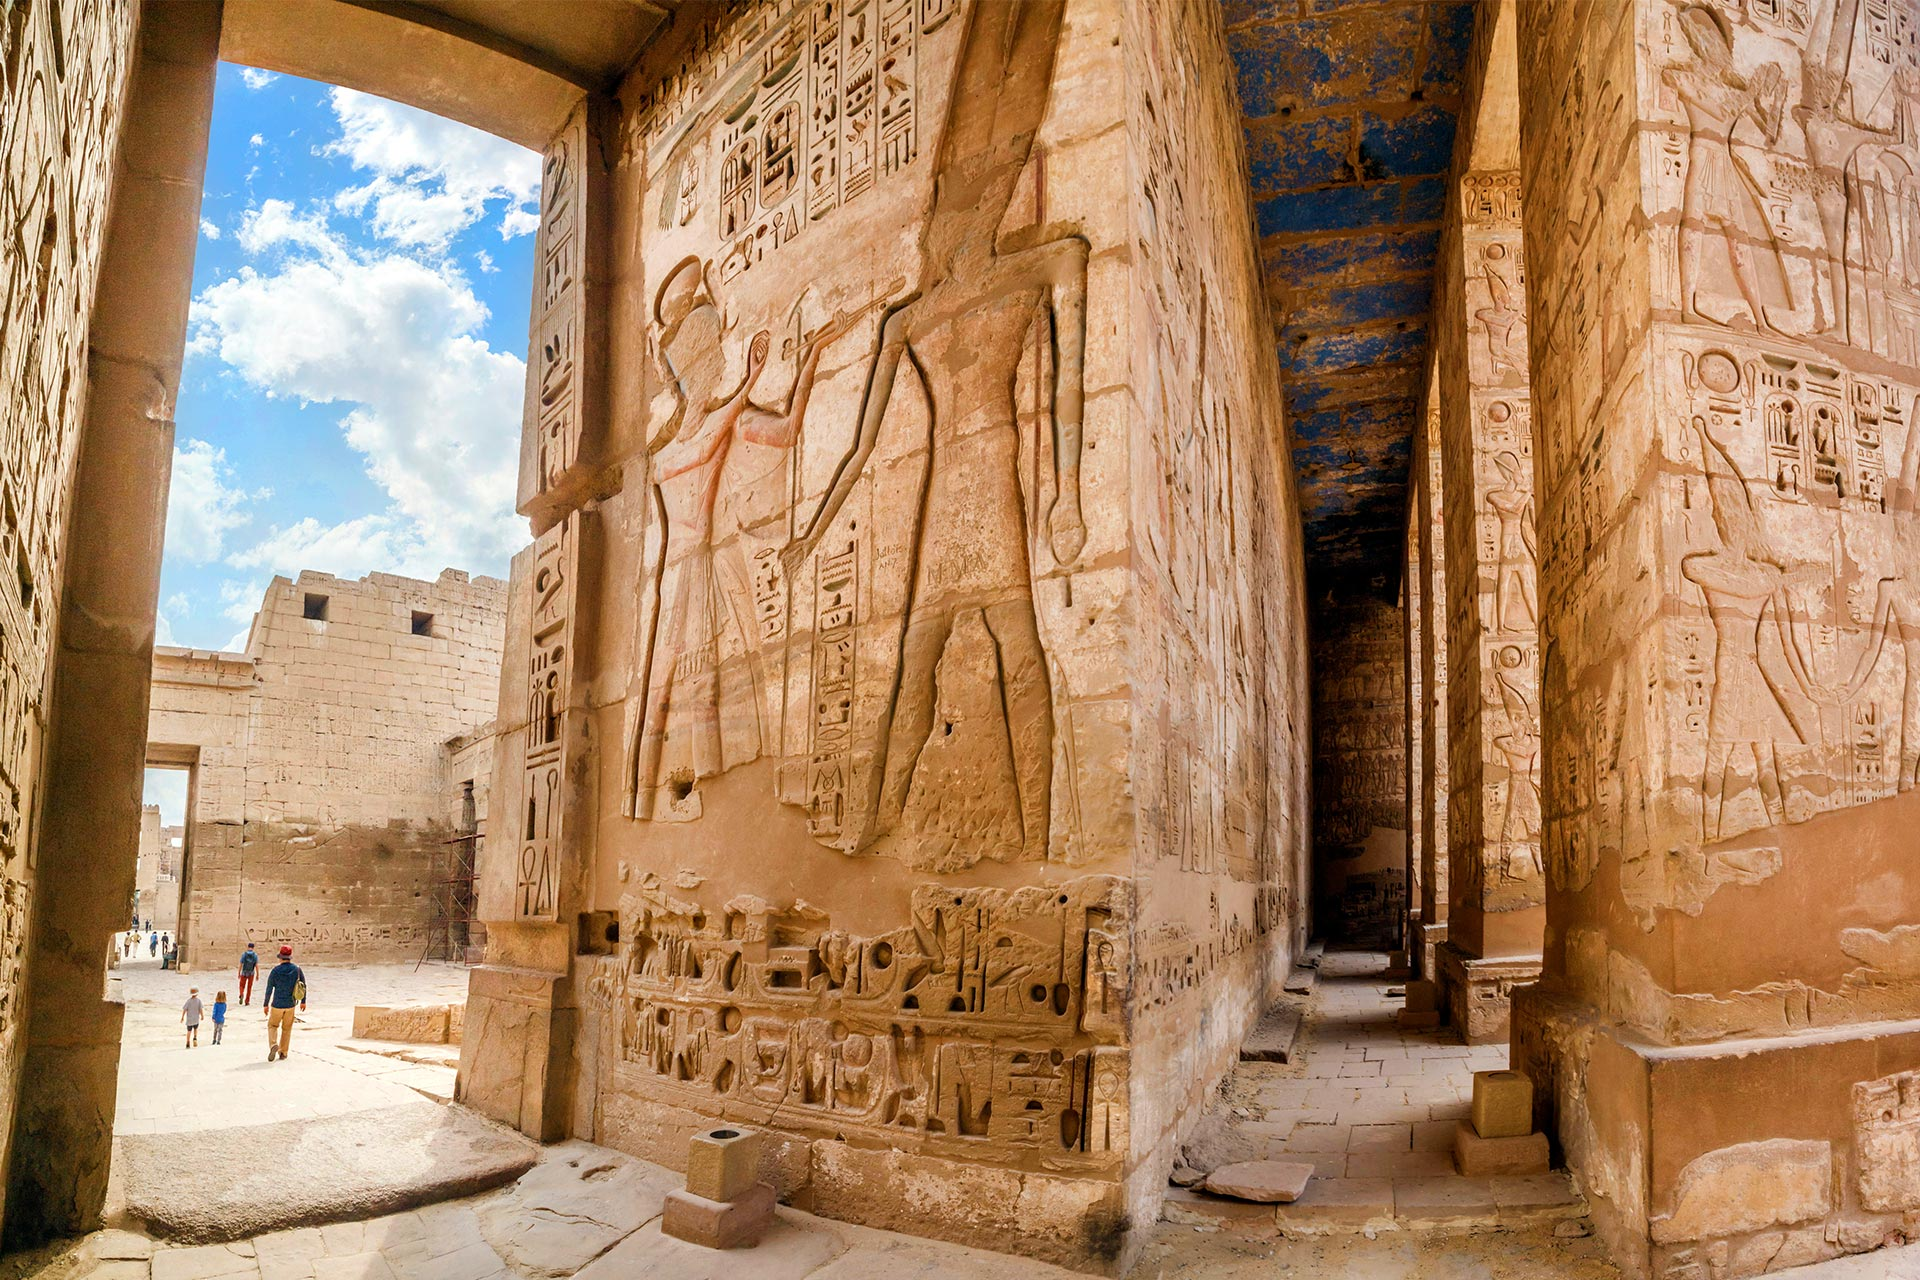 Circuit de grup - Discover Egipt, 8 zile - septembrie 2021